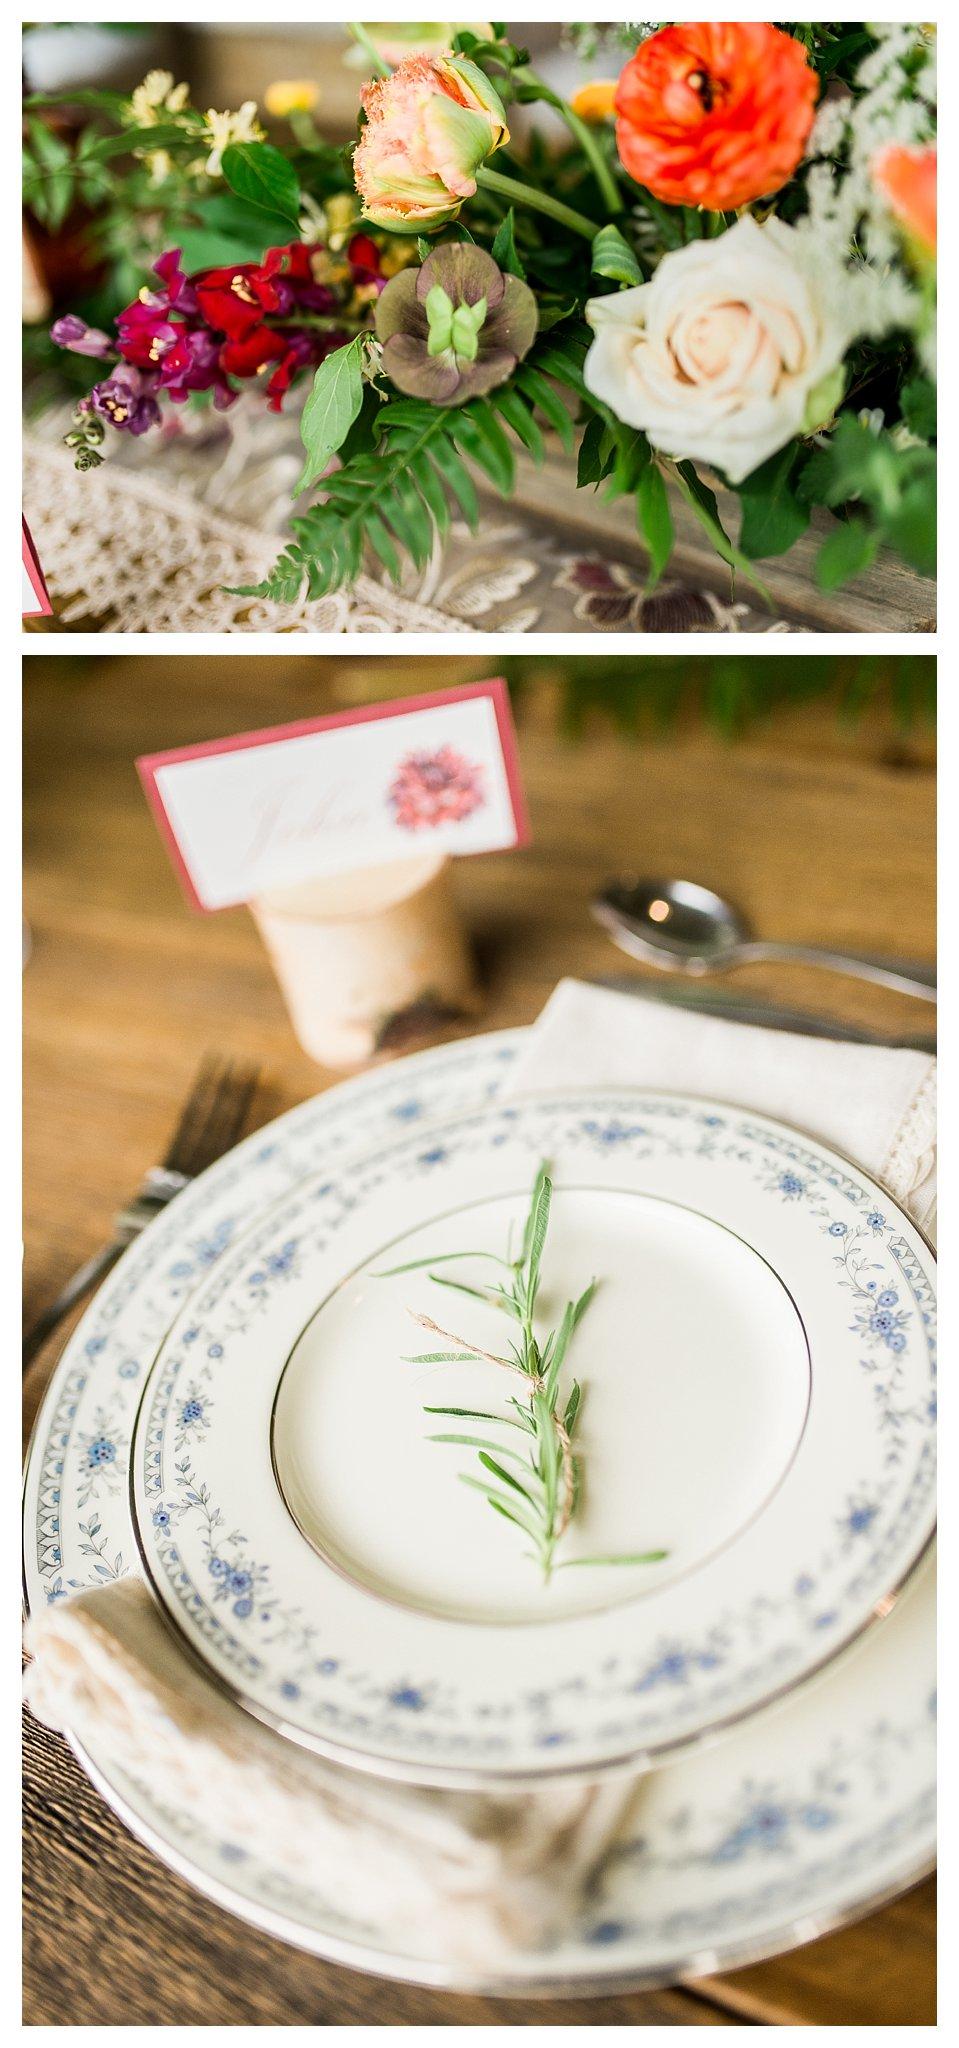 everleigh-photography-northern-kentucky-wedding-photographer-rustic-cabin-wedding-cincinnati-wedding-photographer-wedding-photo-inspiration-wedding-decor-inspiration-10